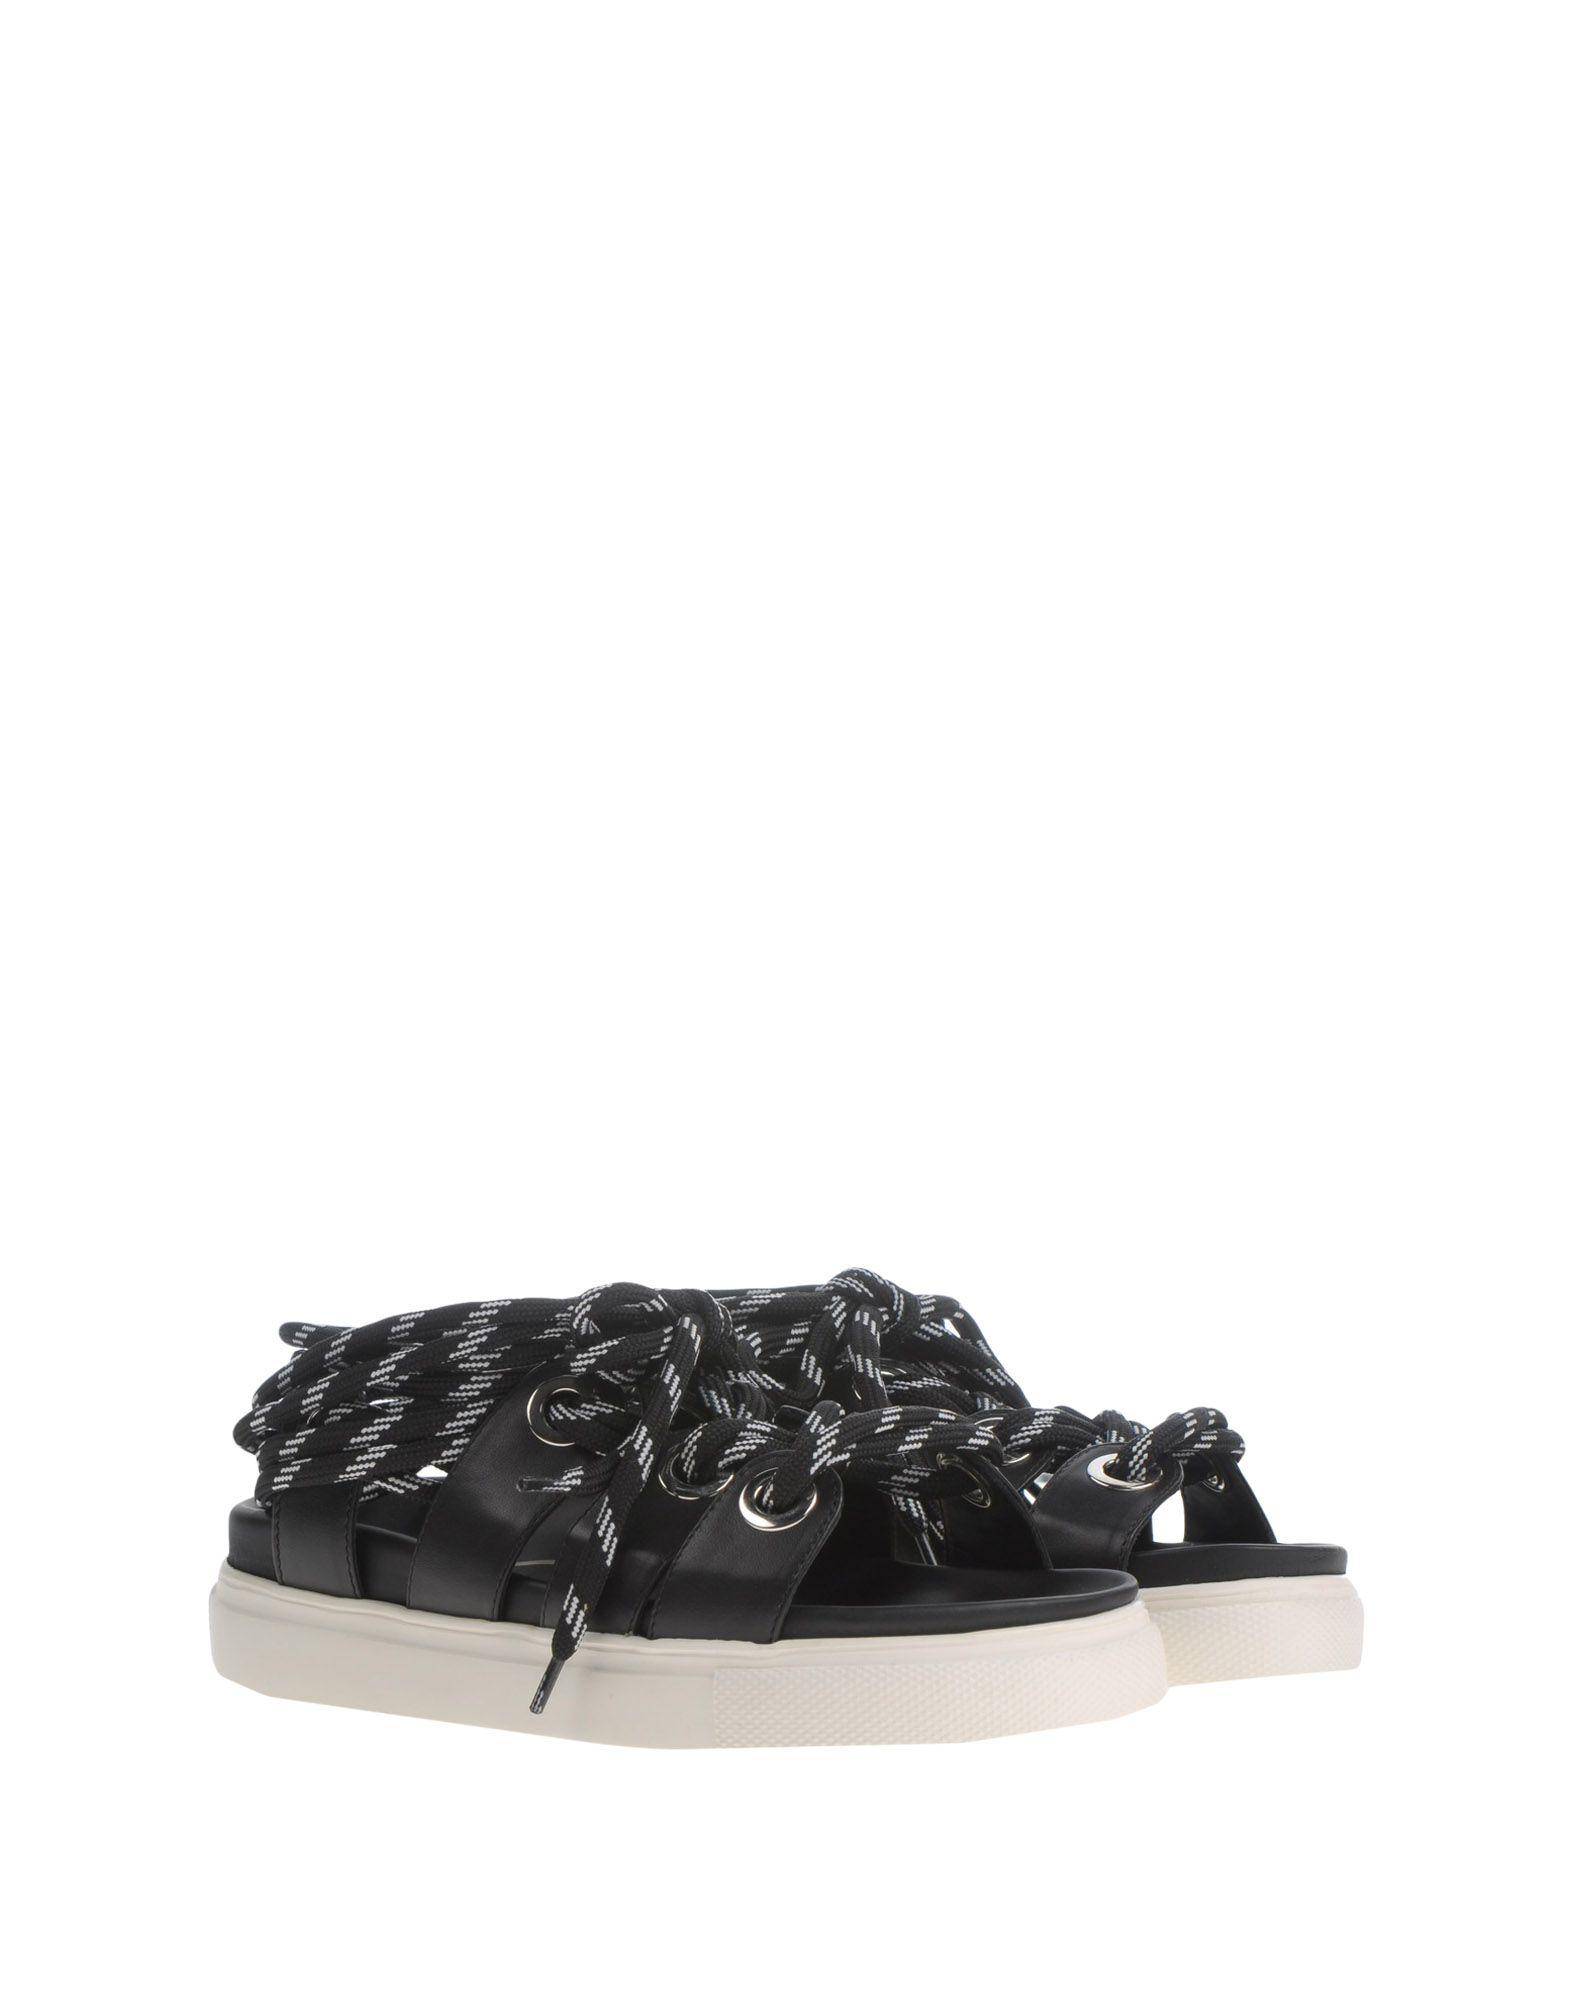 Gut um billige Schuhe zu 11341207UW tragenN° 21 Sandalen Damen 11341207UW zu 4e6e40